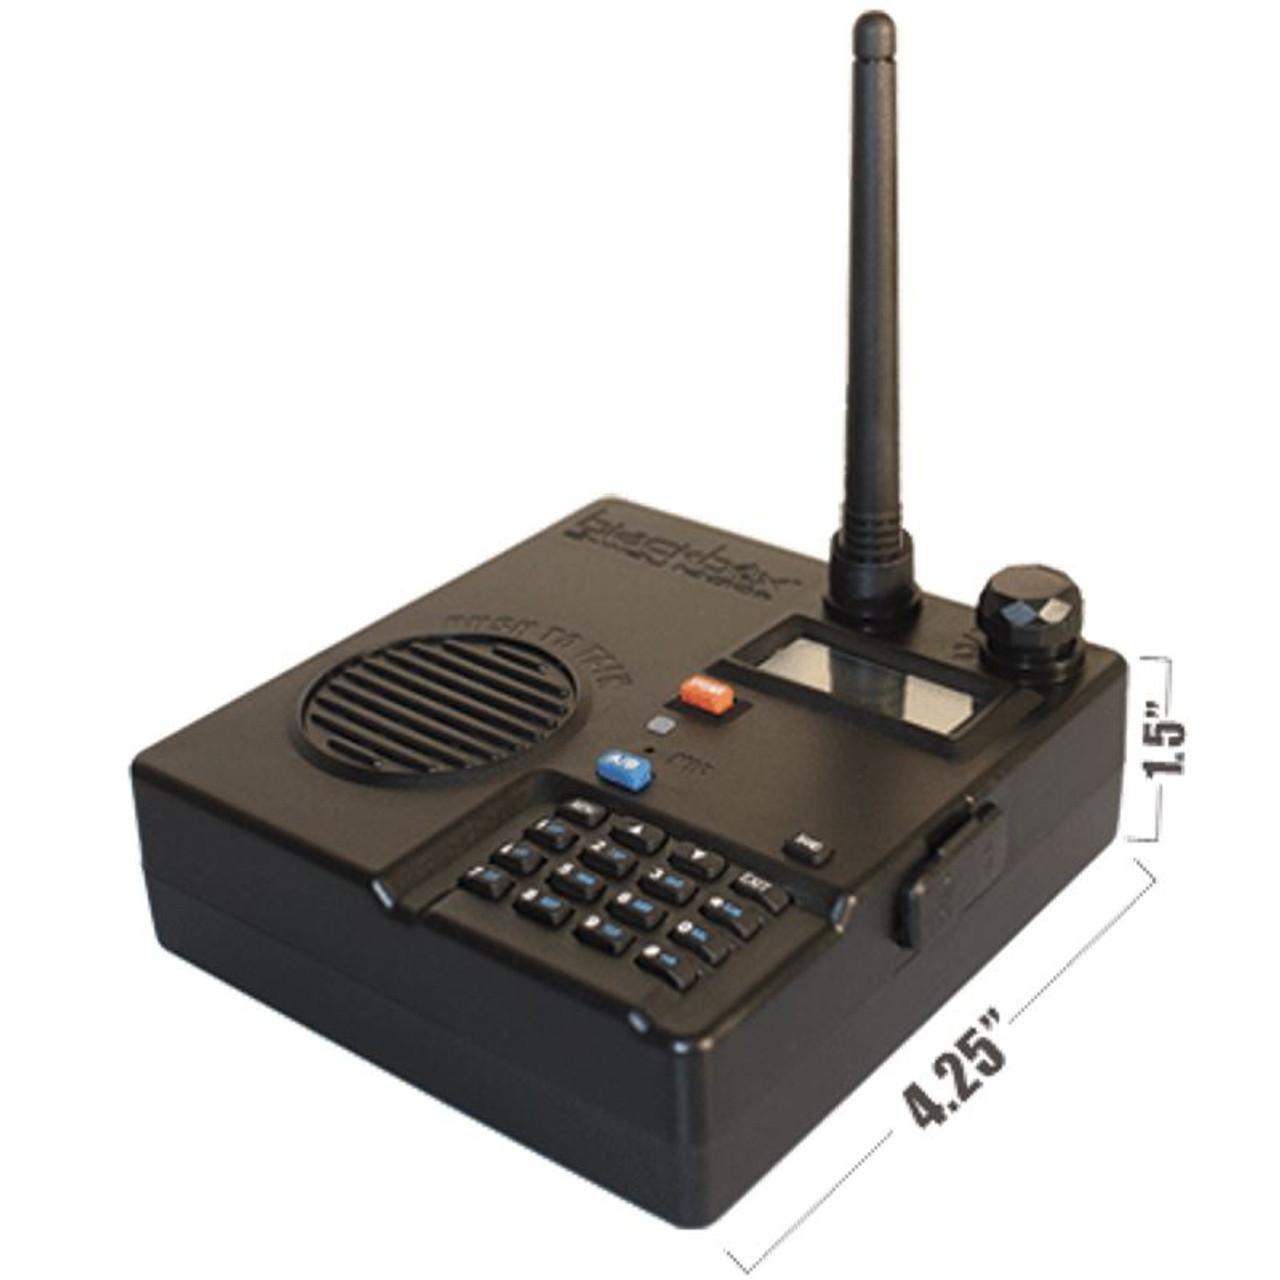 blackbox desktop base station is 4 watt has 128 channel and is rh nuradios com Motorola Base Station Repeater Marine Radio Base Station